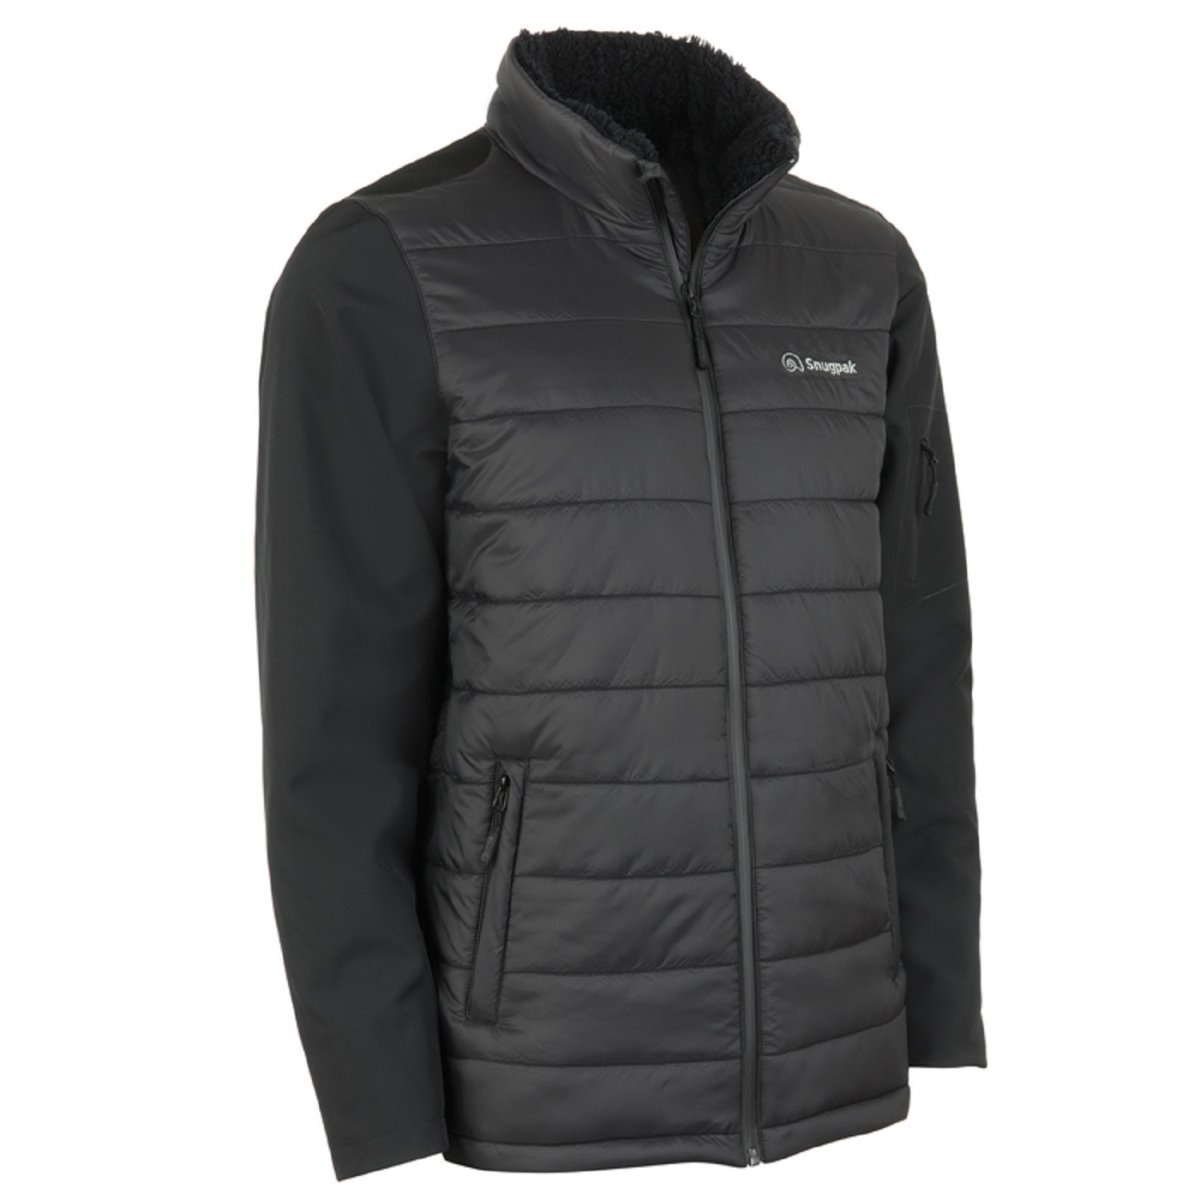 Snugpak - Fusion Insulated Jacket - Black - XL